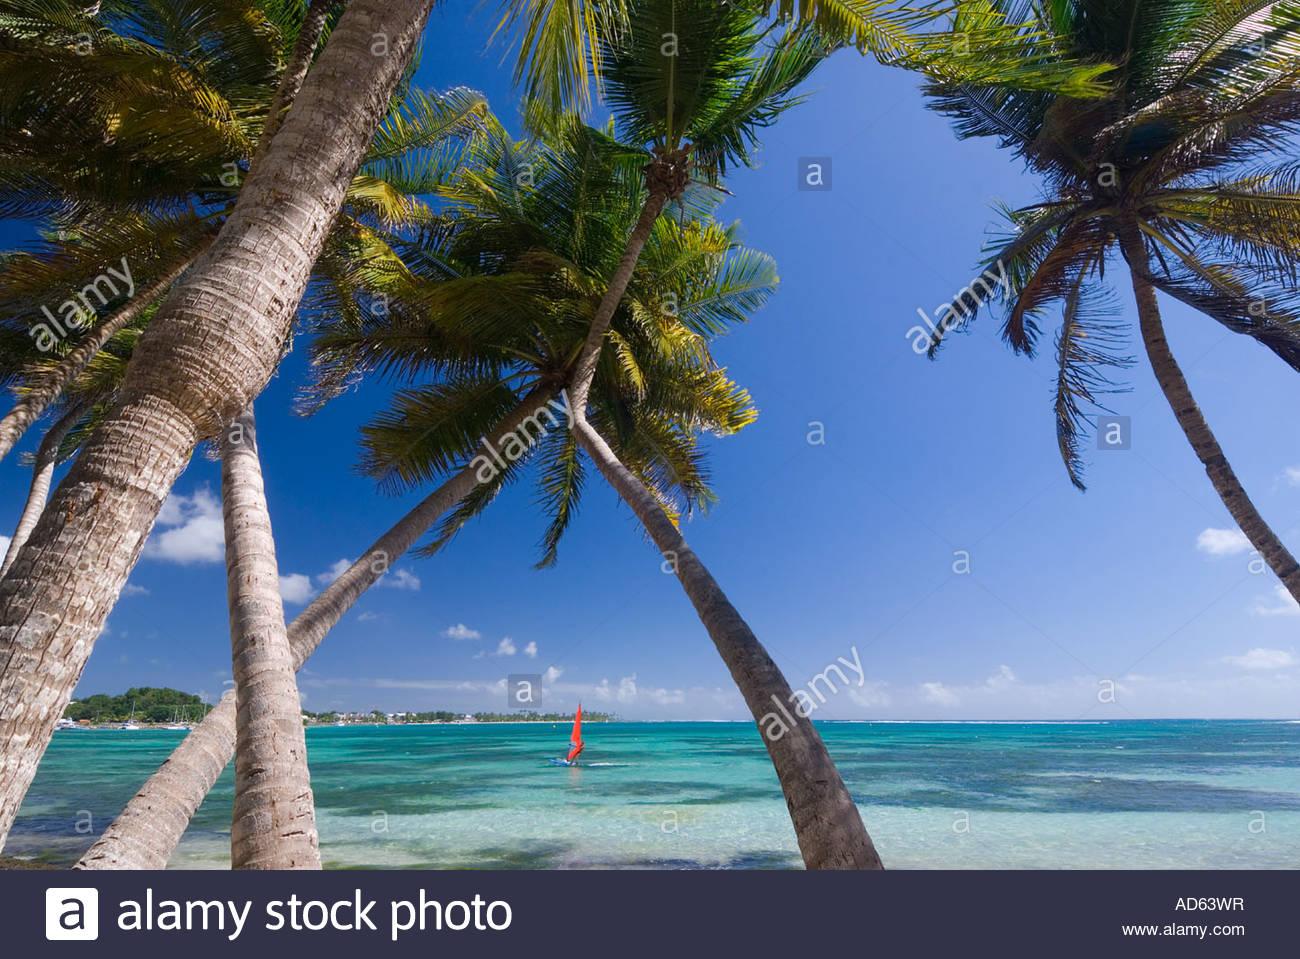 Palm trees and windsurfer at La Plage de la Caravelle, Grande Terre, Guadeloupe - Stock Image